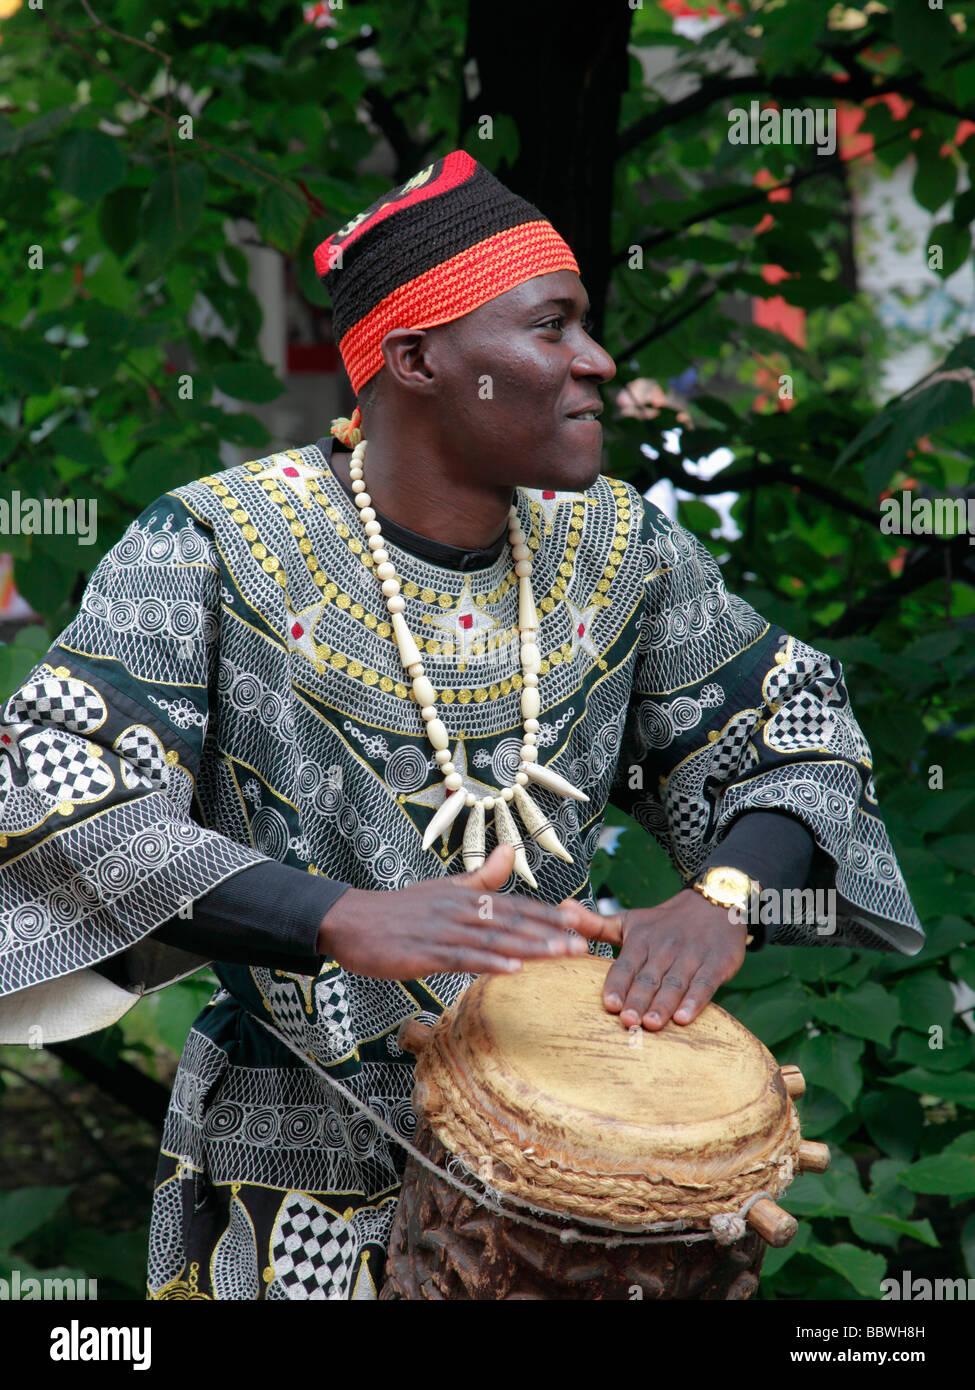 Deutschland Berlin Karneval der Kulturen afrikanischer Musiker Schlagzeuger Stockbild